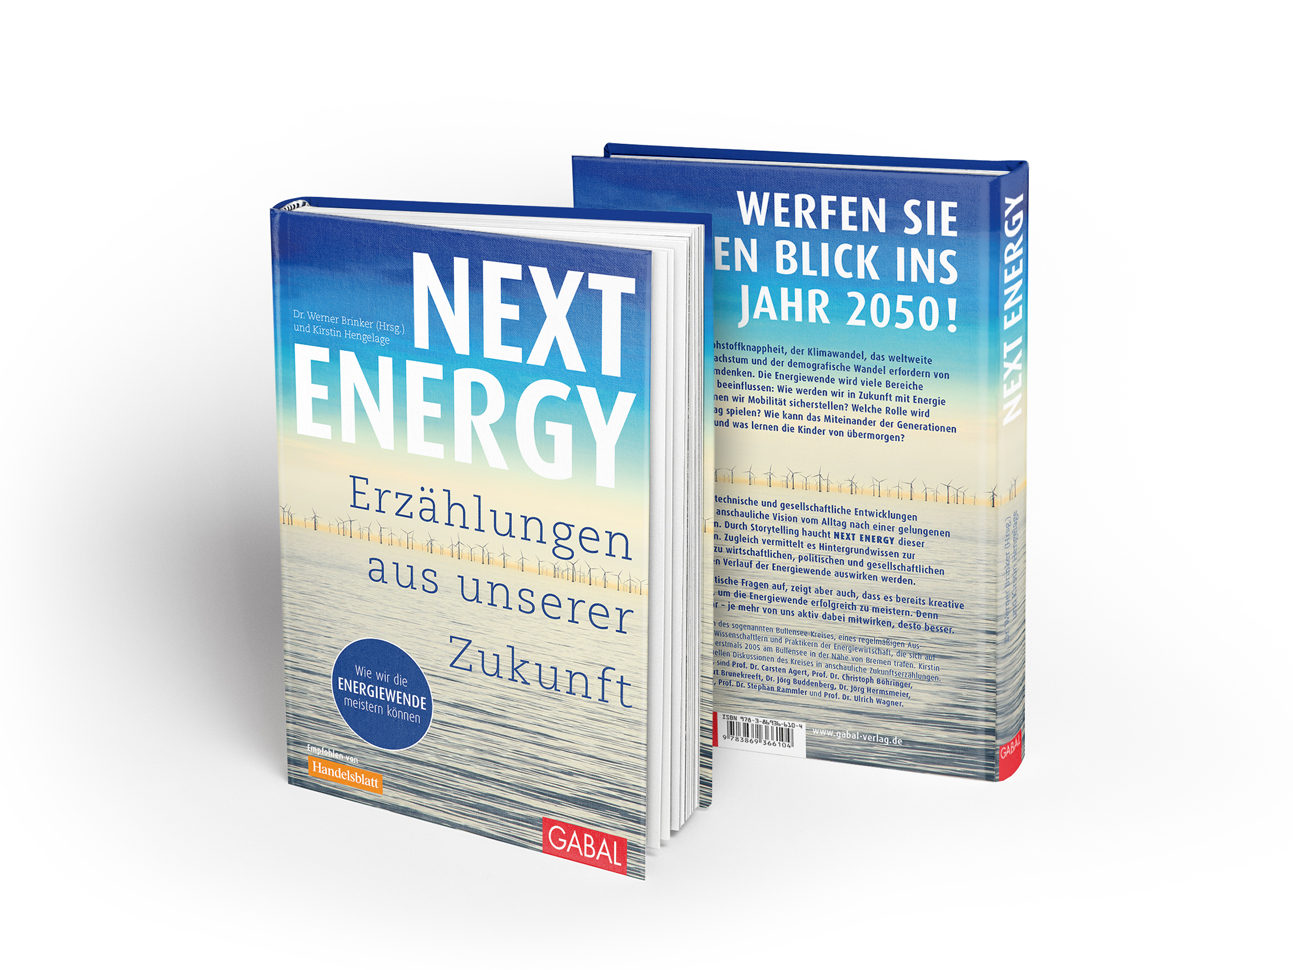 martin_zech_design_buchcovergestaltung_gabal_verlag_werner_brinker_next_energy